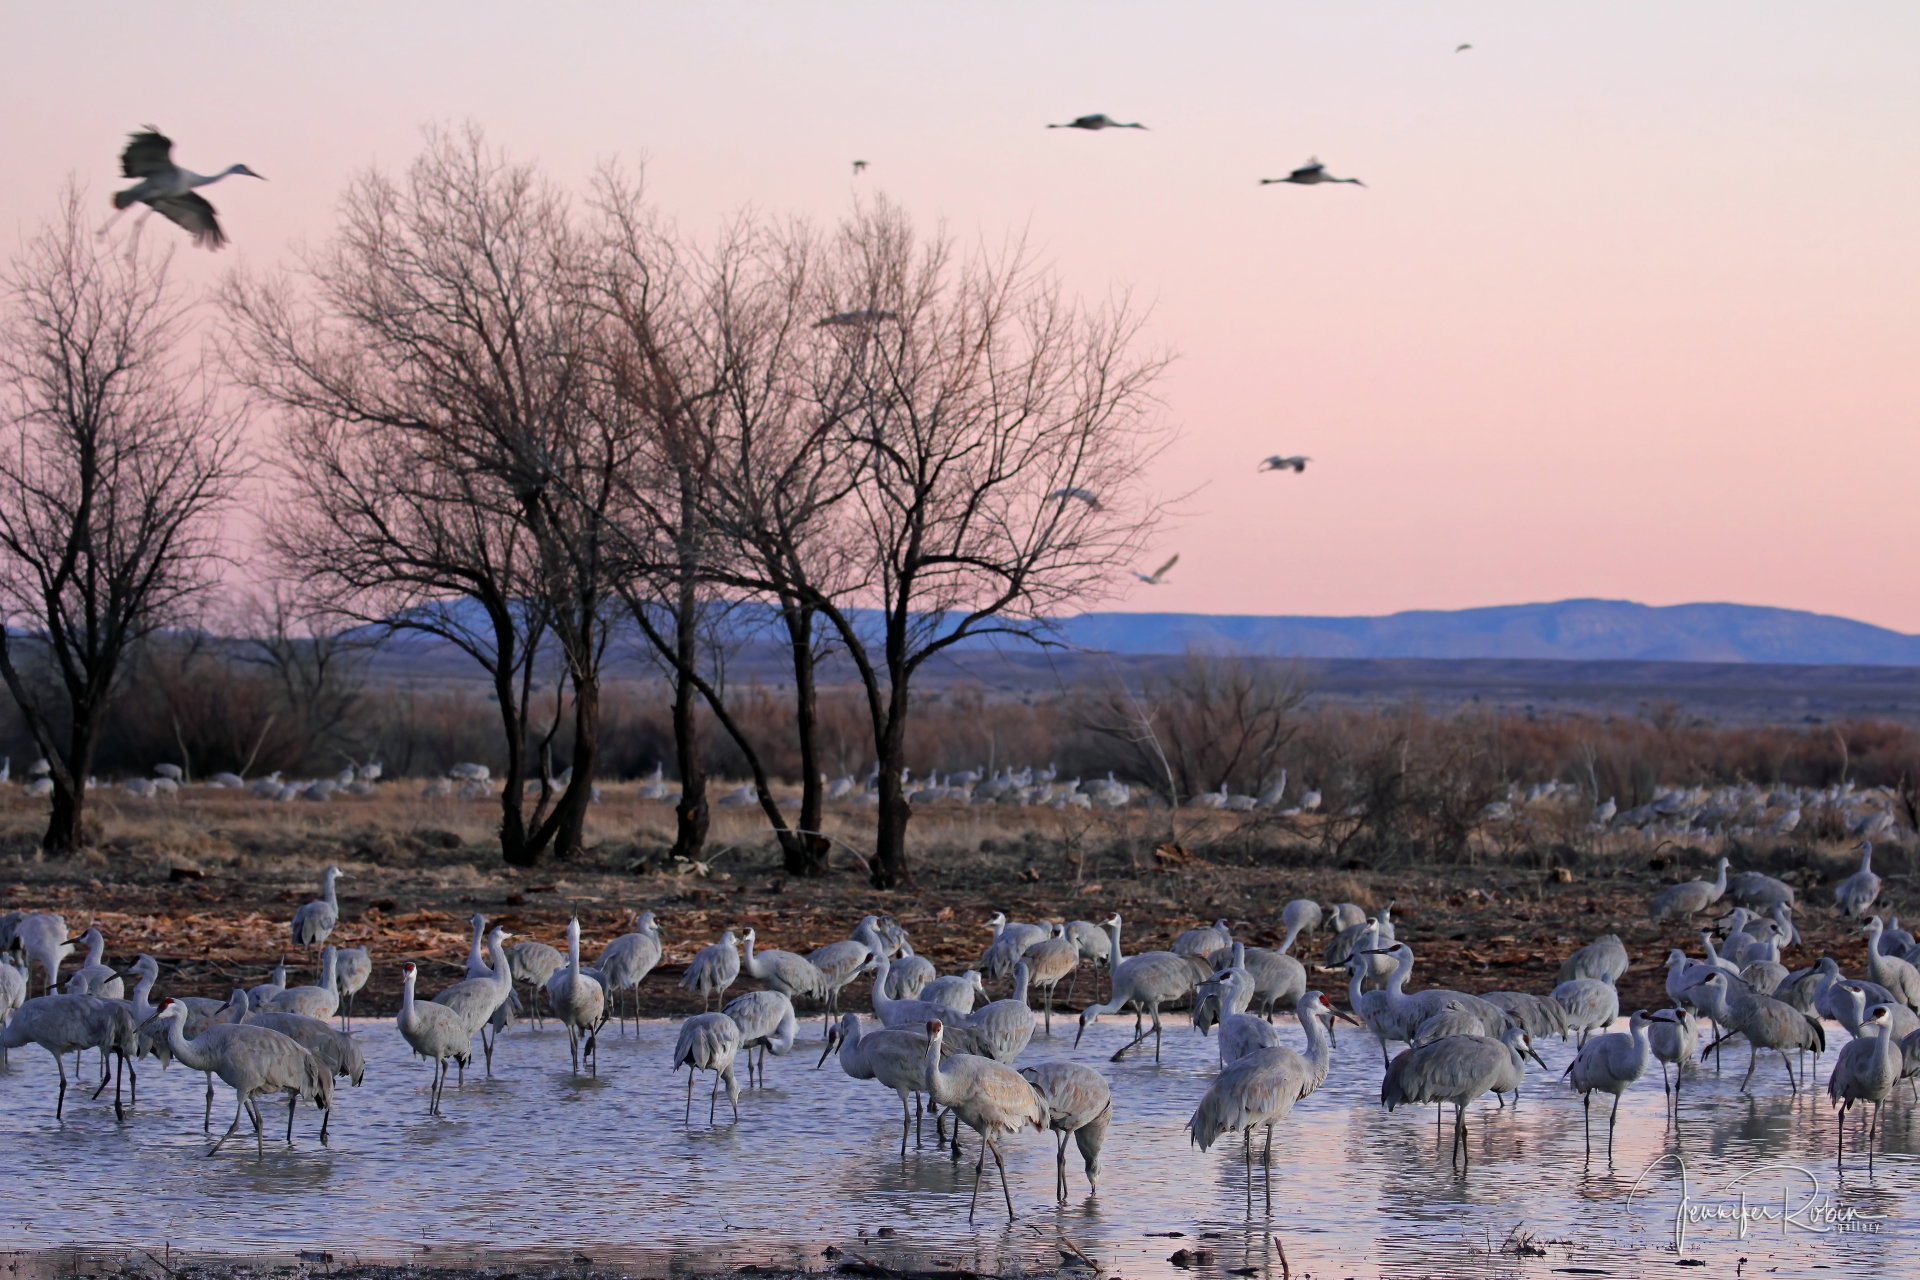 A mountain landscape of sandhill cranes at sunset. Ladd S Gordon Waterfowl Complex - Bernardo Wildlife Area